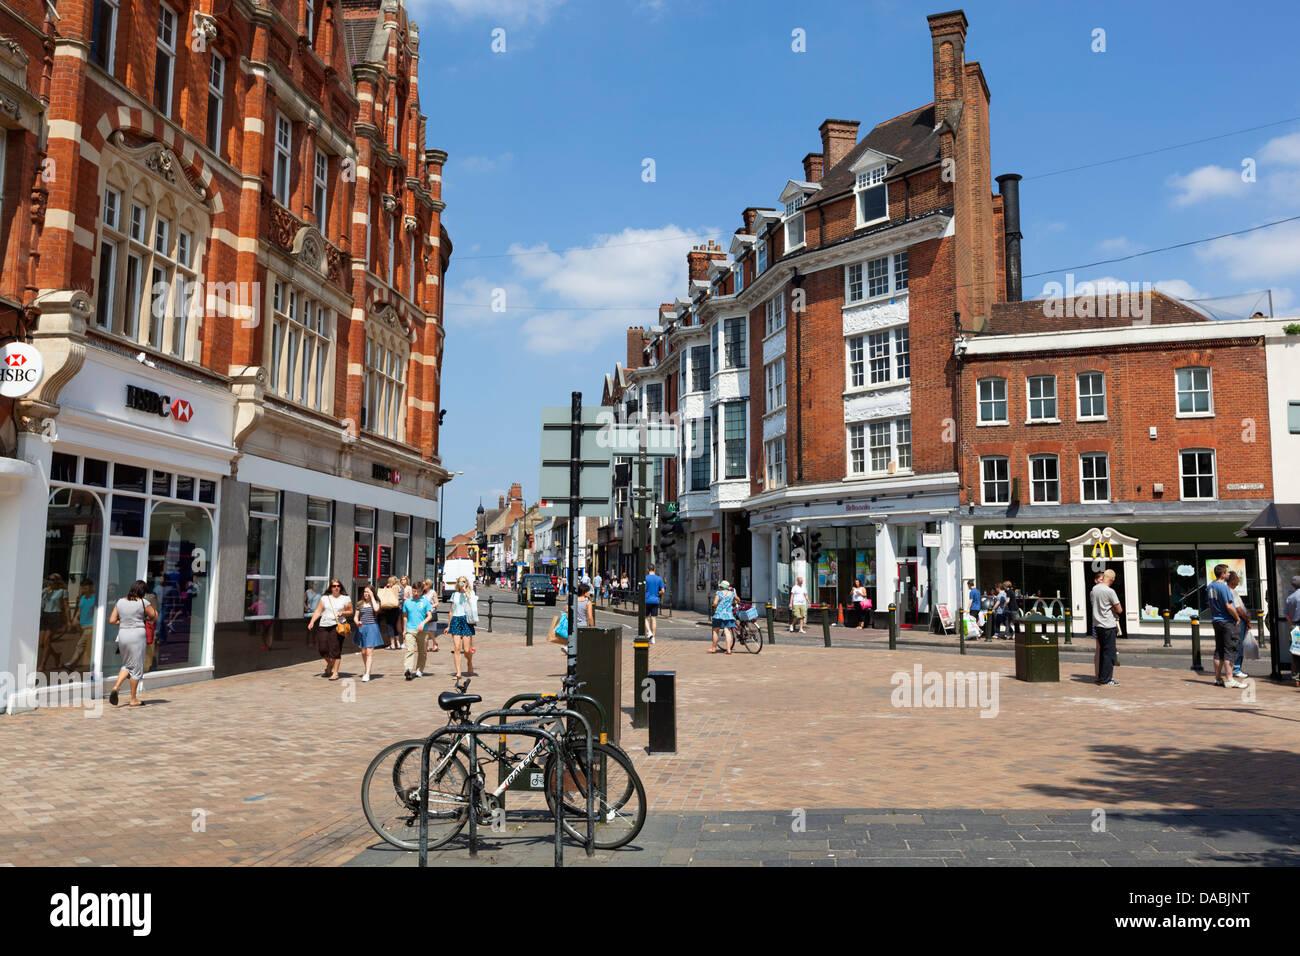 Bromley High Street - Stock Image